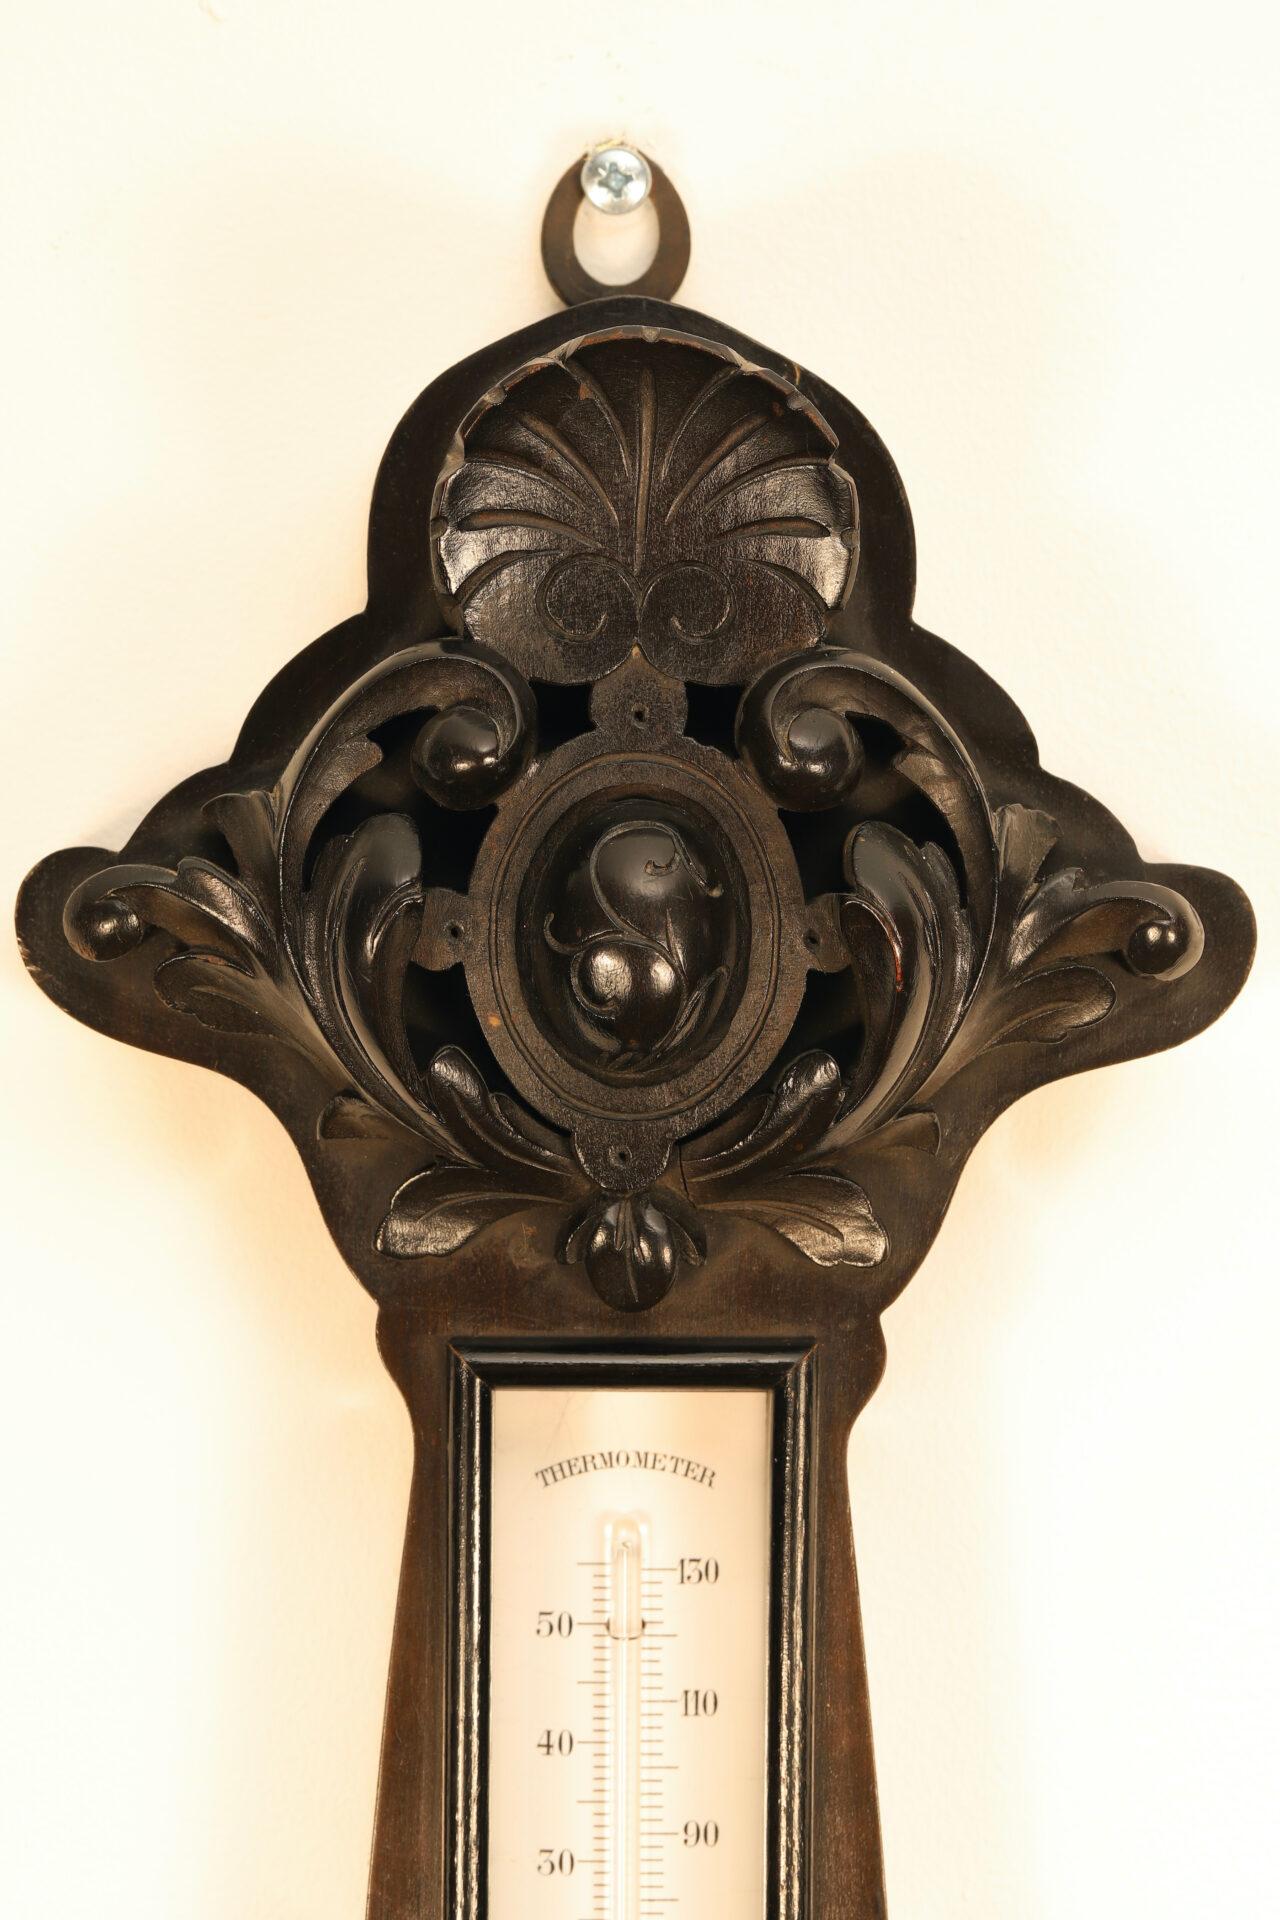 Top of ebonised carved surround for Jules Richard Bourdon Barometer No 45028 c1900